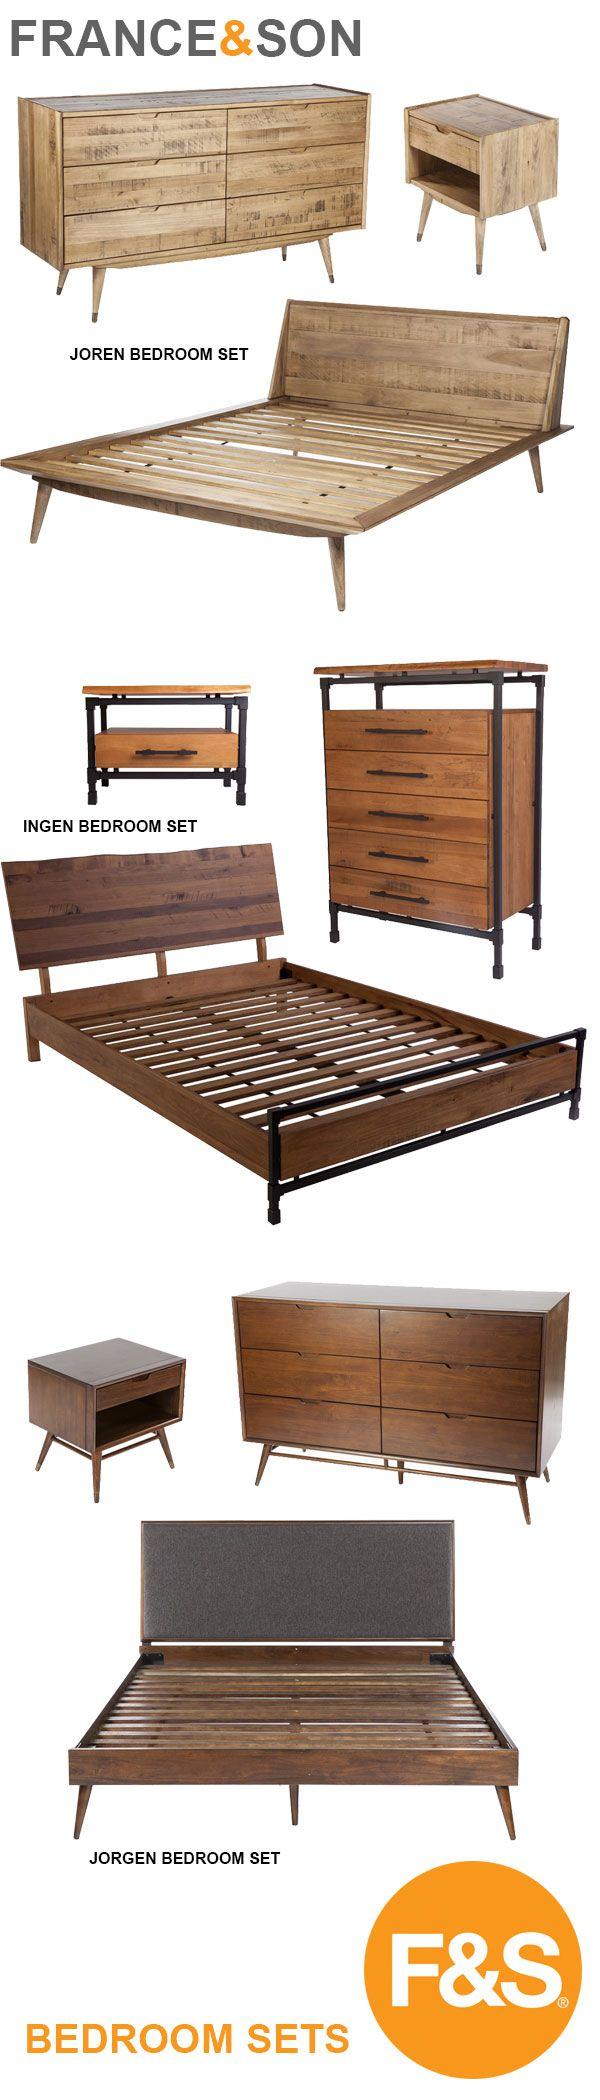 15 Mustsee Bedroom Sets Pins  White bedroom set Blue